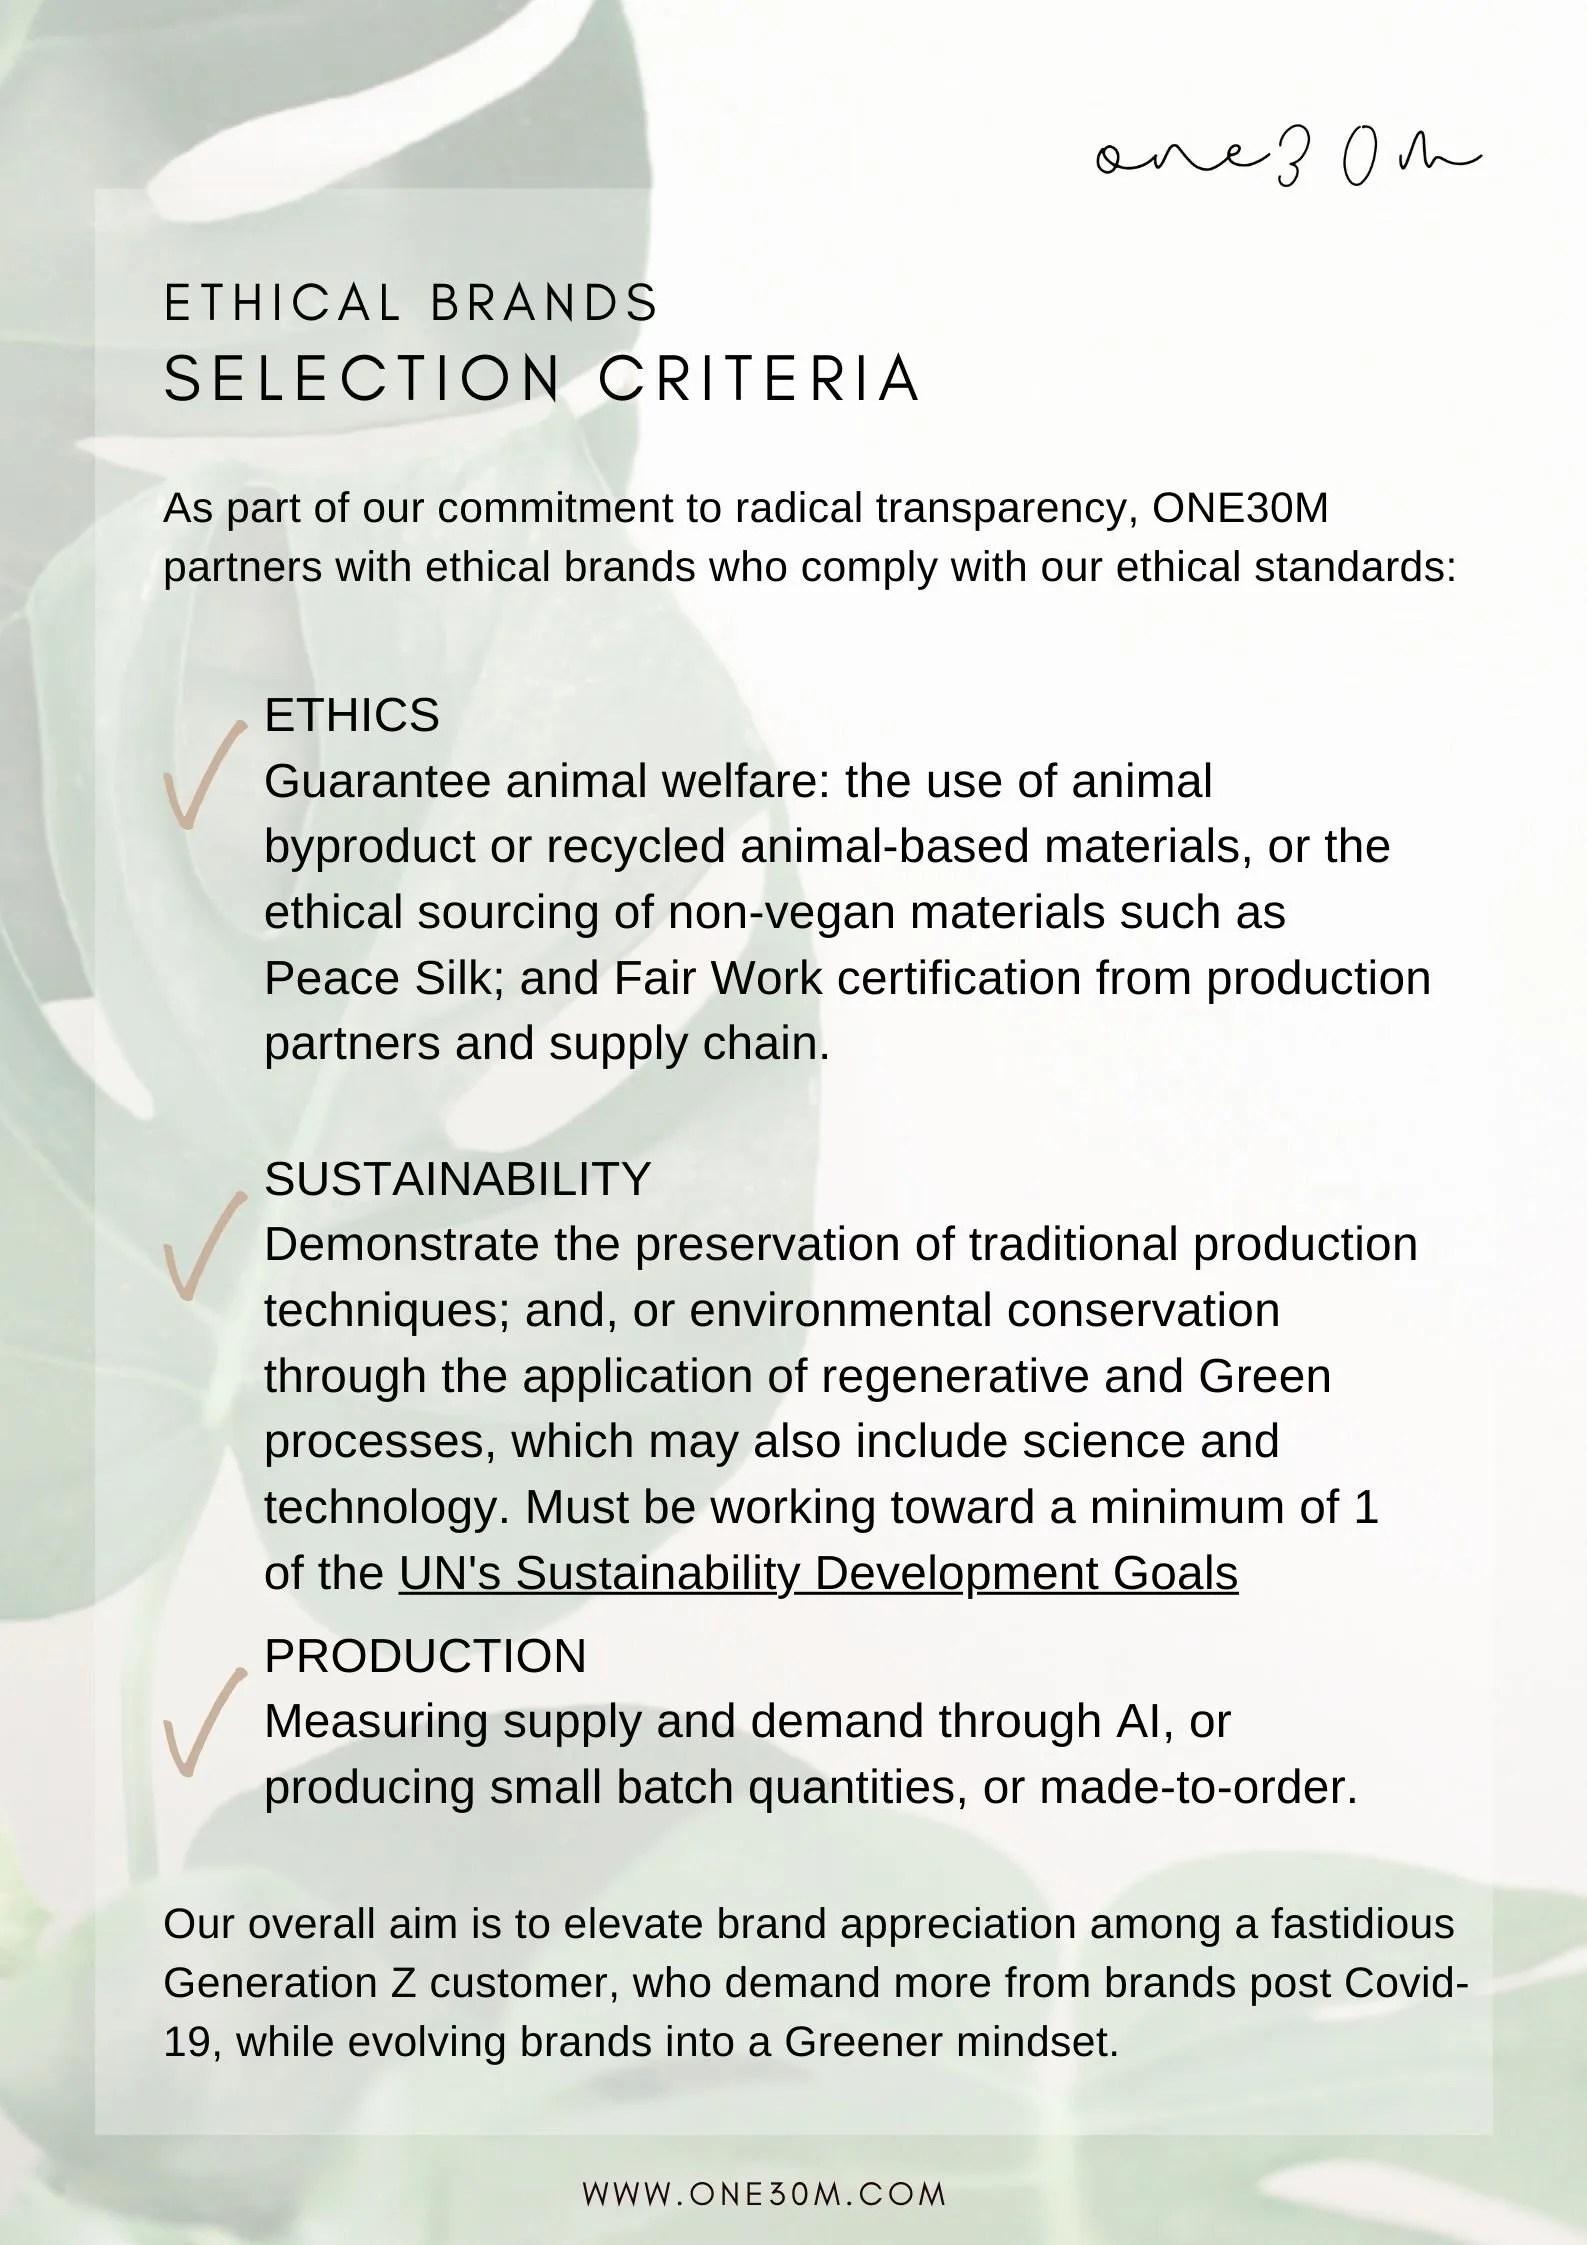 ONE30M Brand Selection Criteria